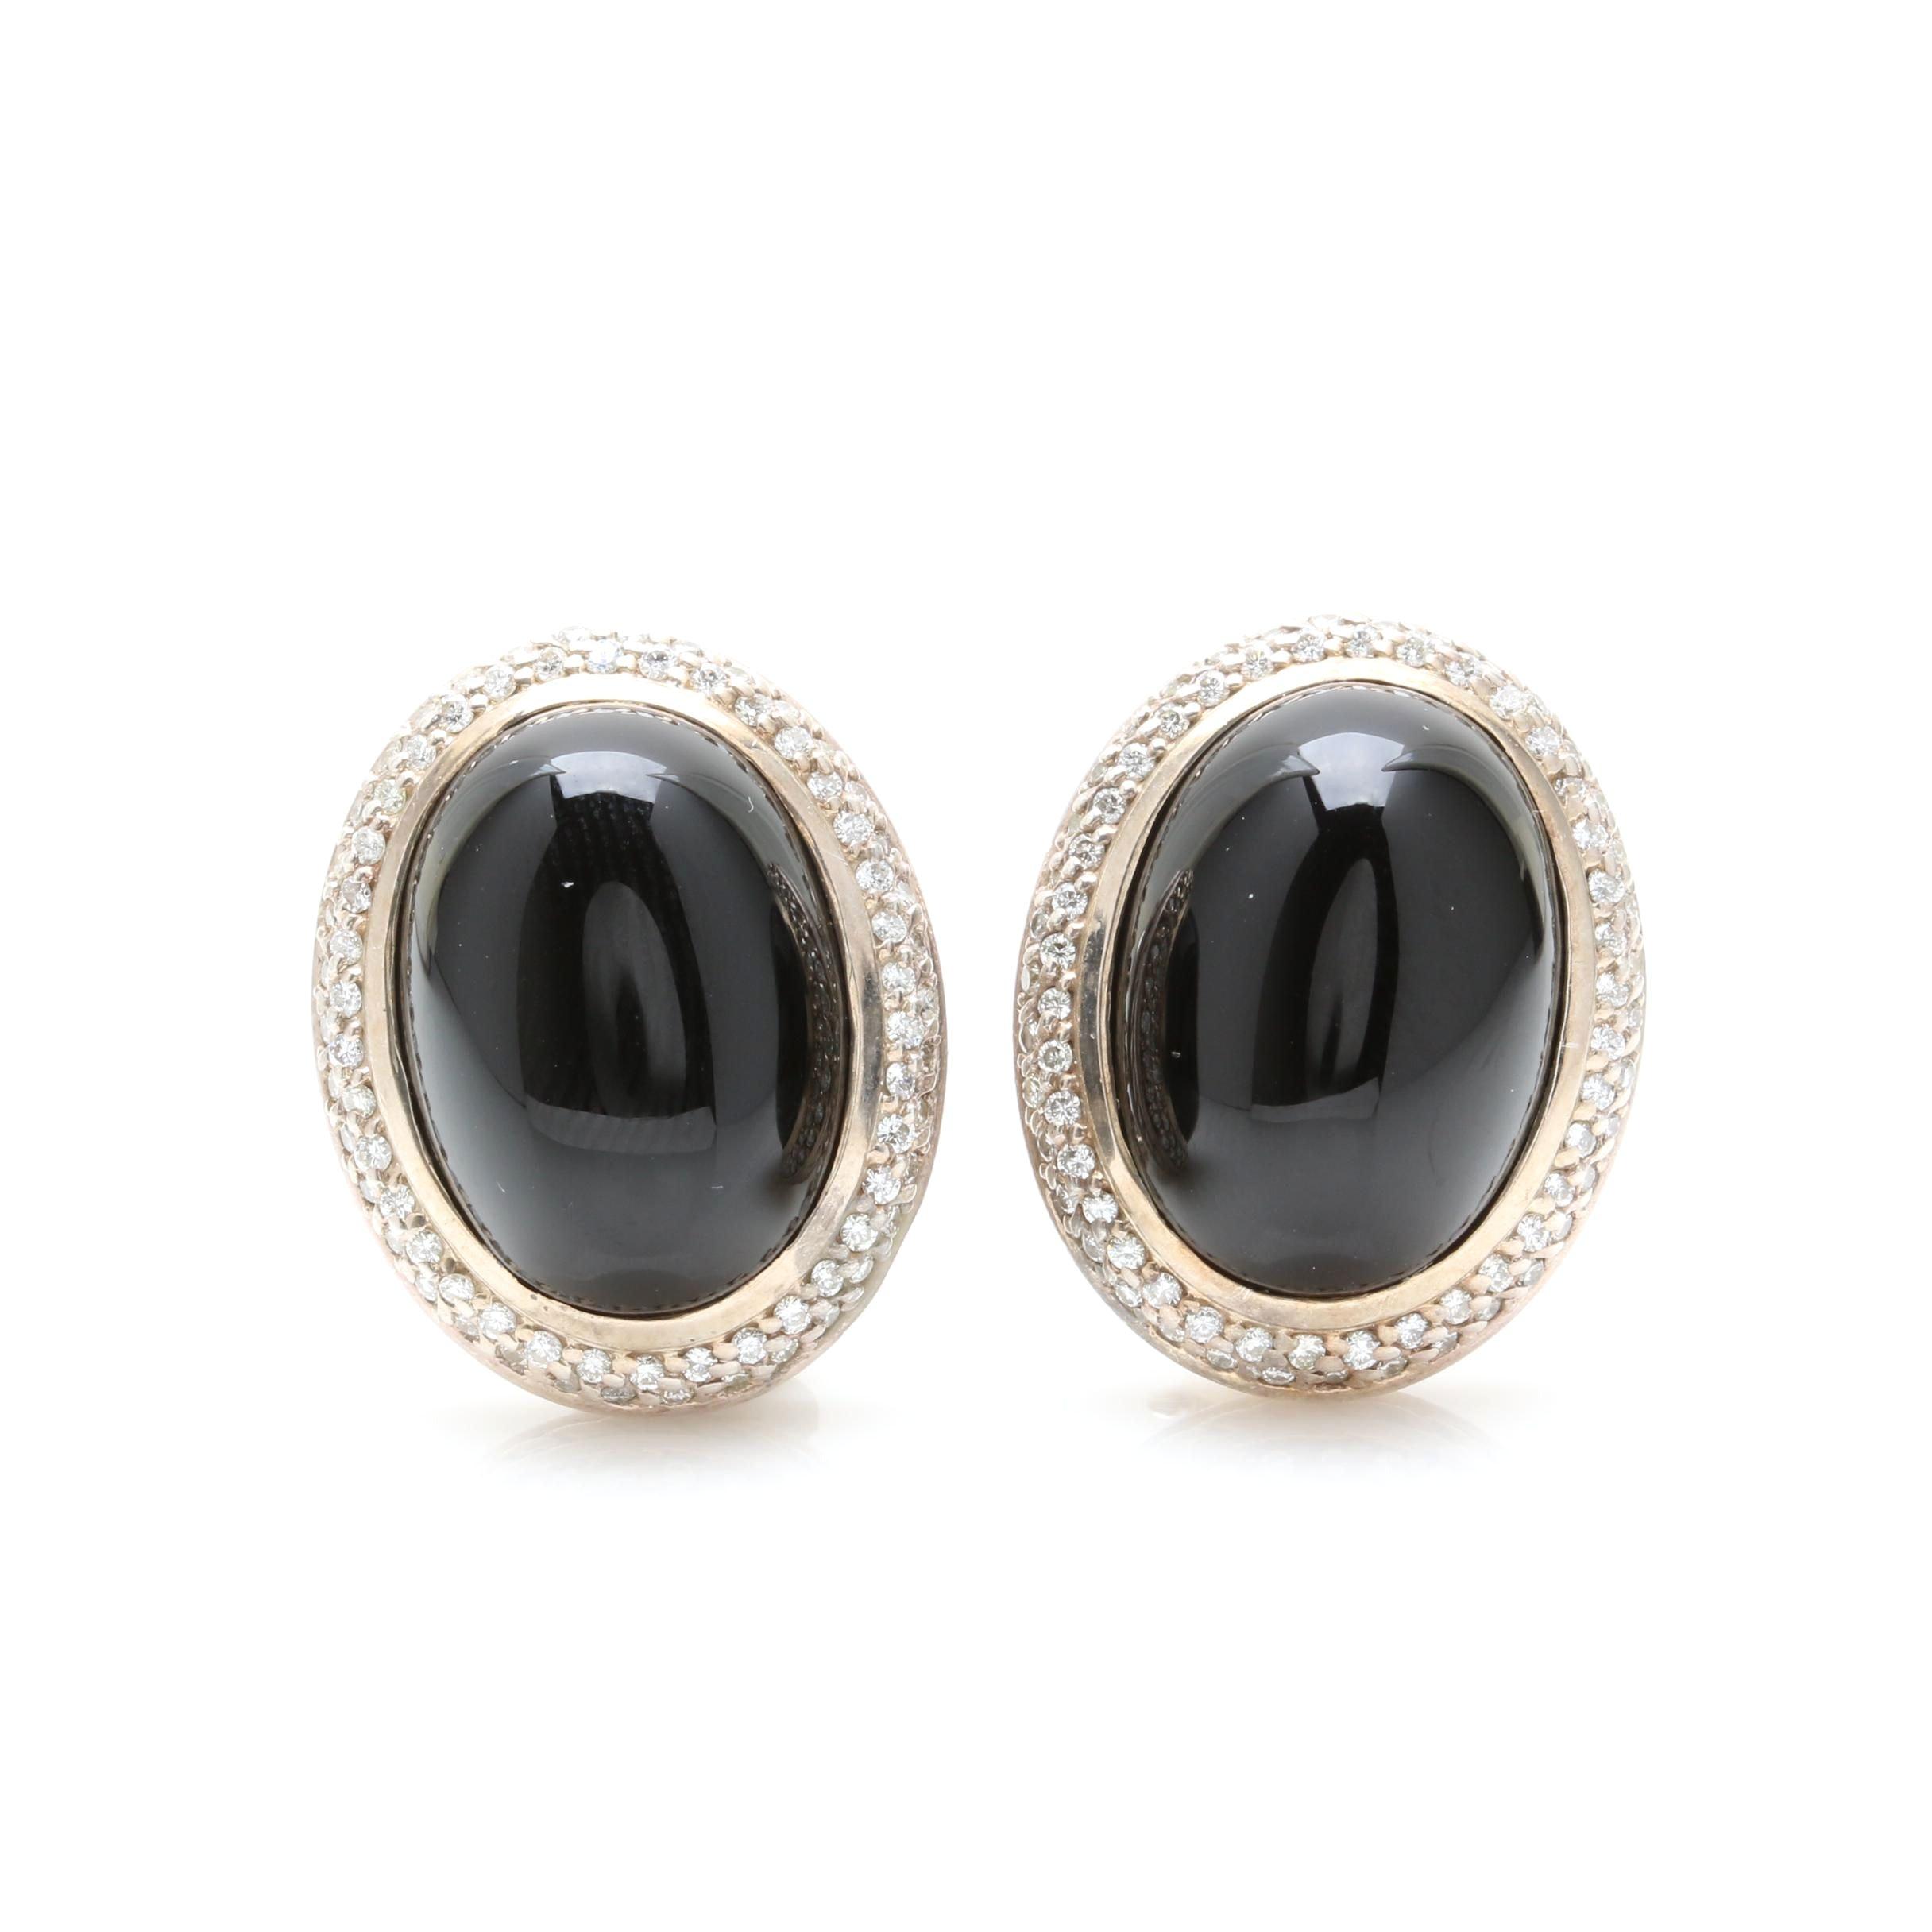 David Yurman Sterling Silver Black Onyx and 1.50 CTW Diamond Earrings